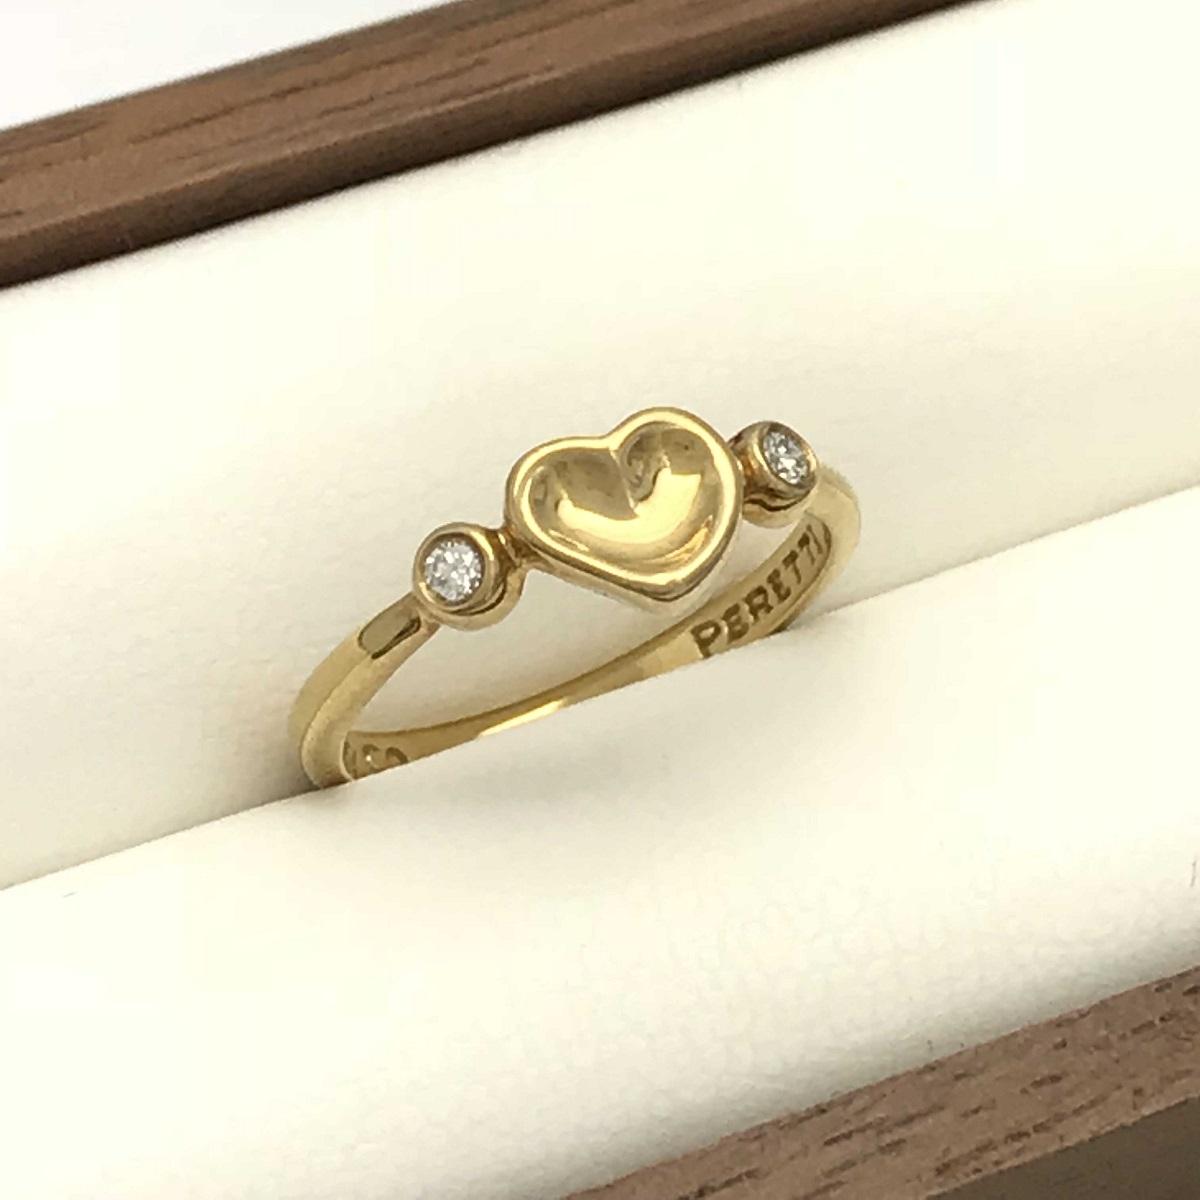 Tiffany & Co. ティファニー ハートダイヤリング 指輪 #10 750YG 【トレジャースポット】【中古】